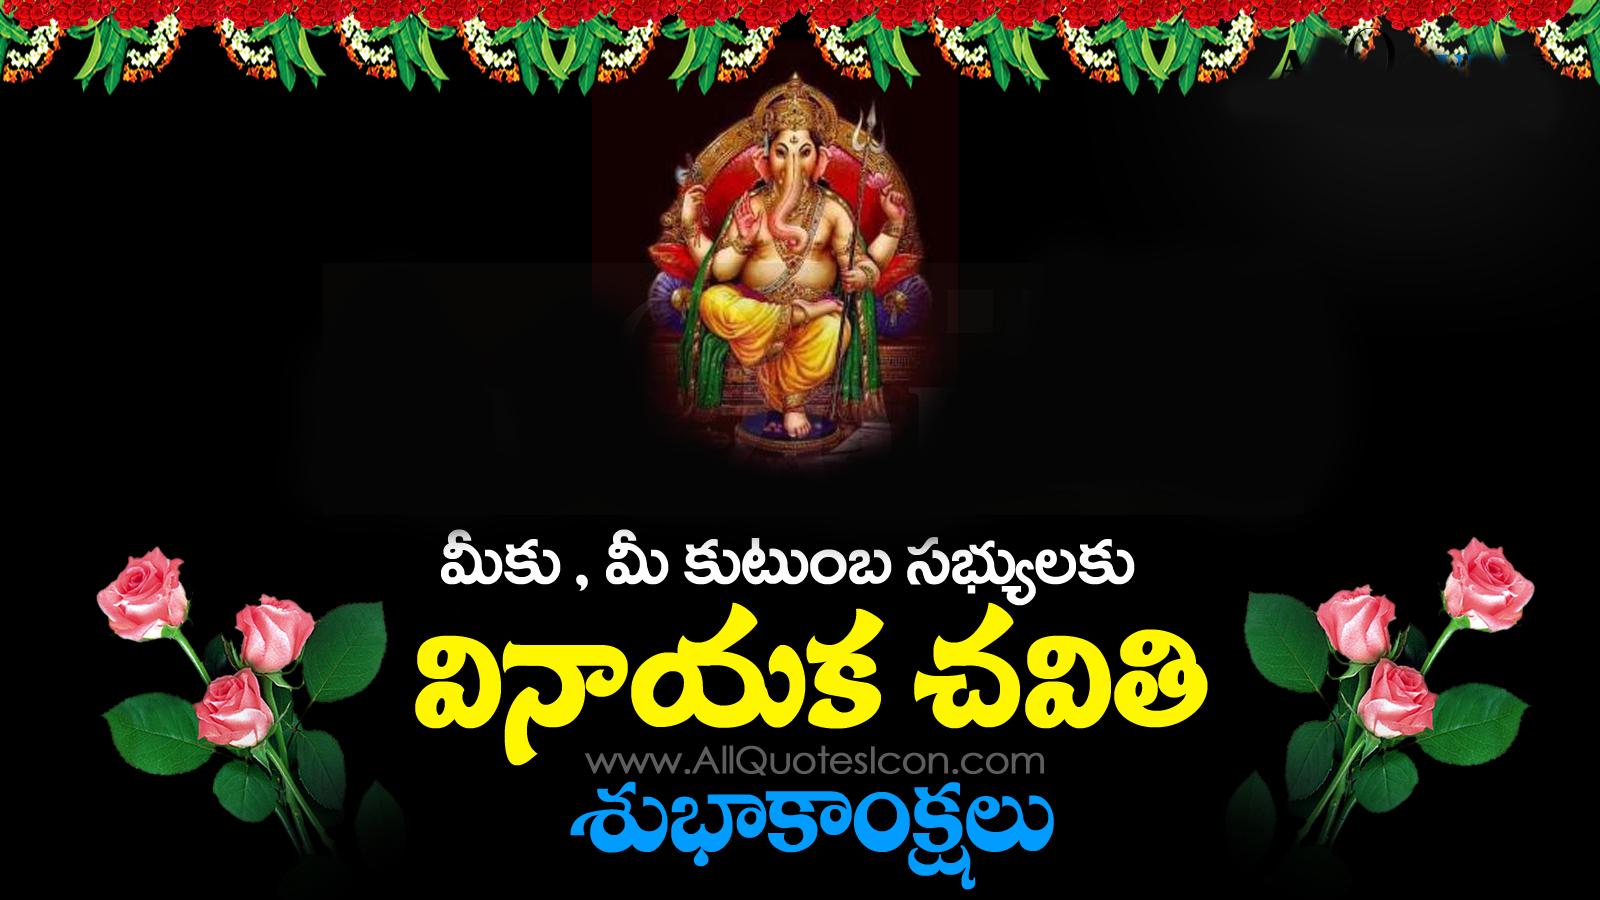 Vinayaka chavithi greeting cards and wallpapers jaitelugutalli ganesh chaturthi widely celebrated in andhrapradesh karnatakavinayaka chavithi quotes in telugu greetings in m4hsunfo Gallery